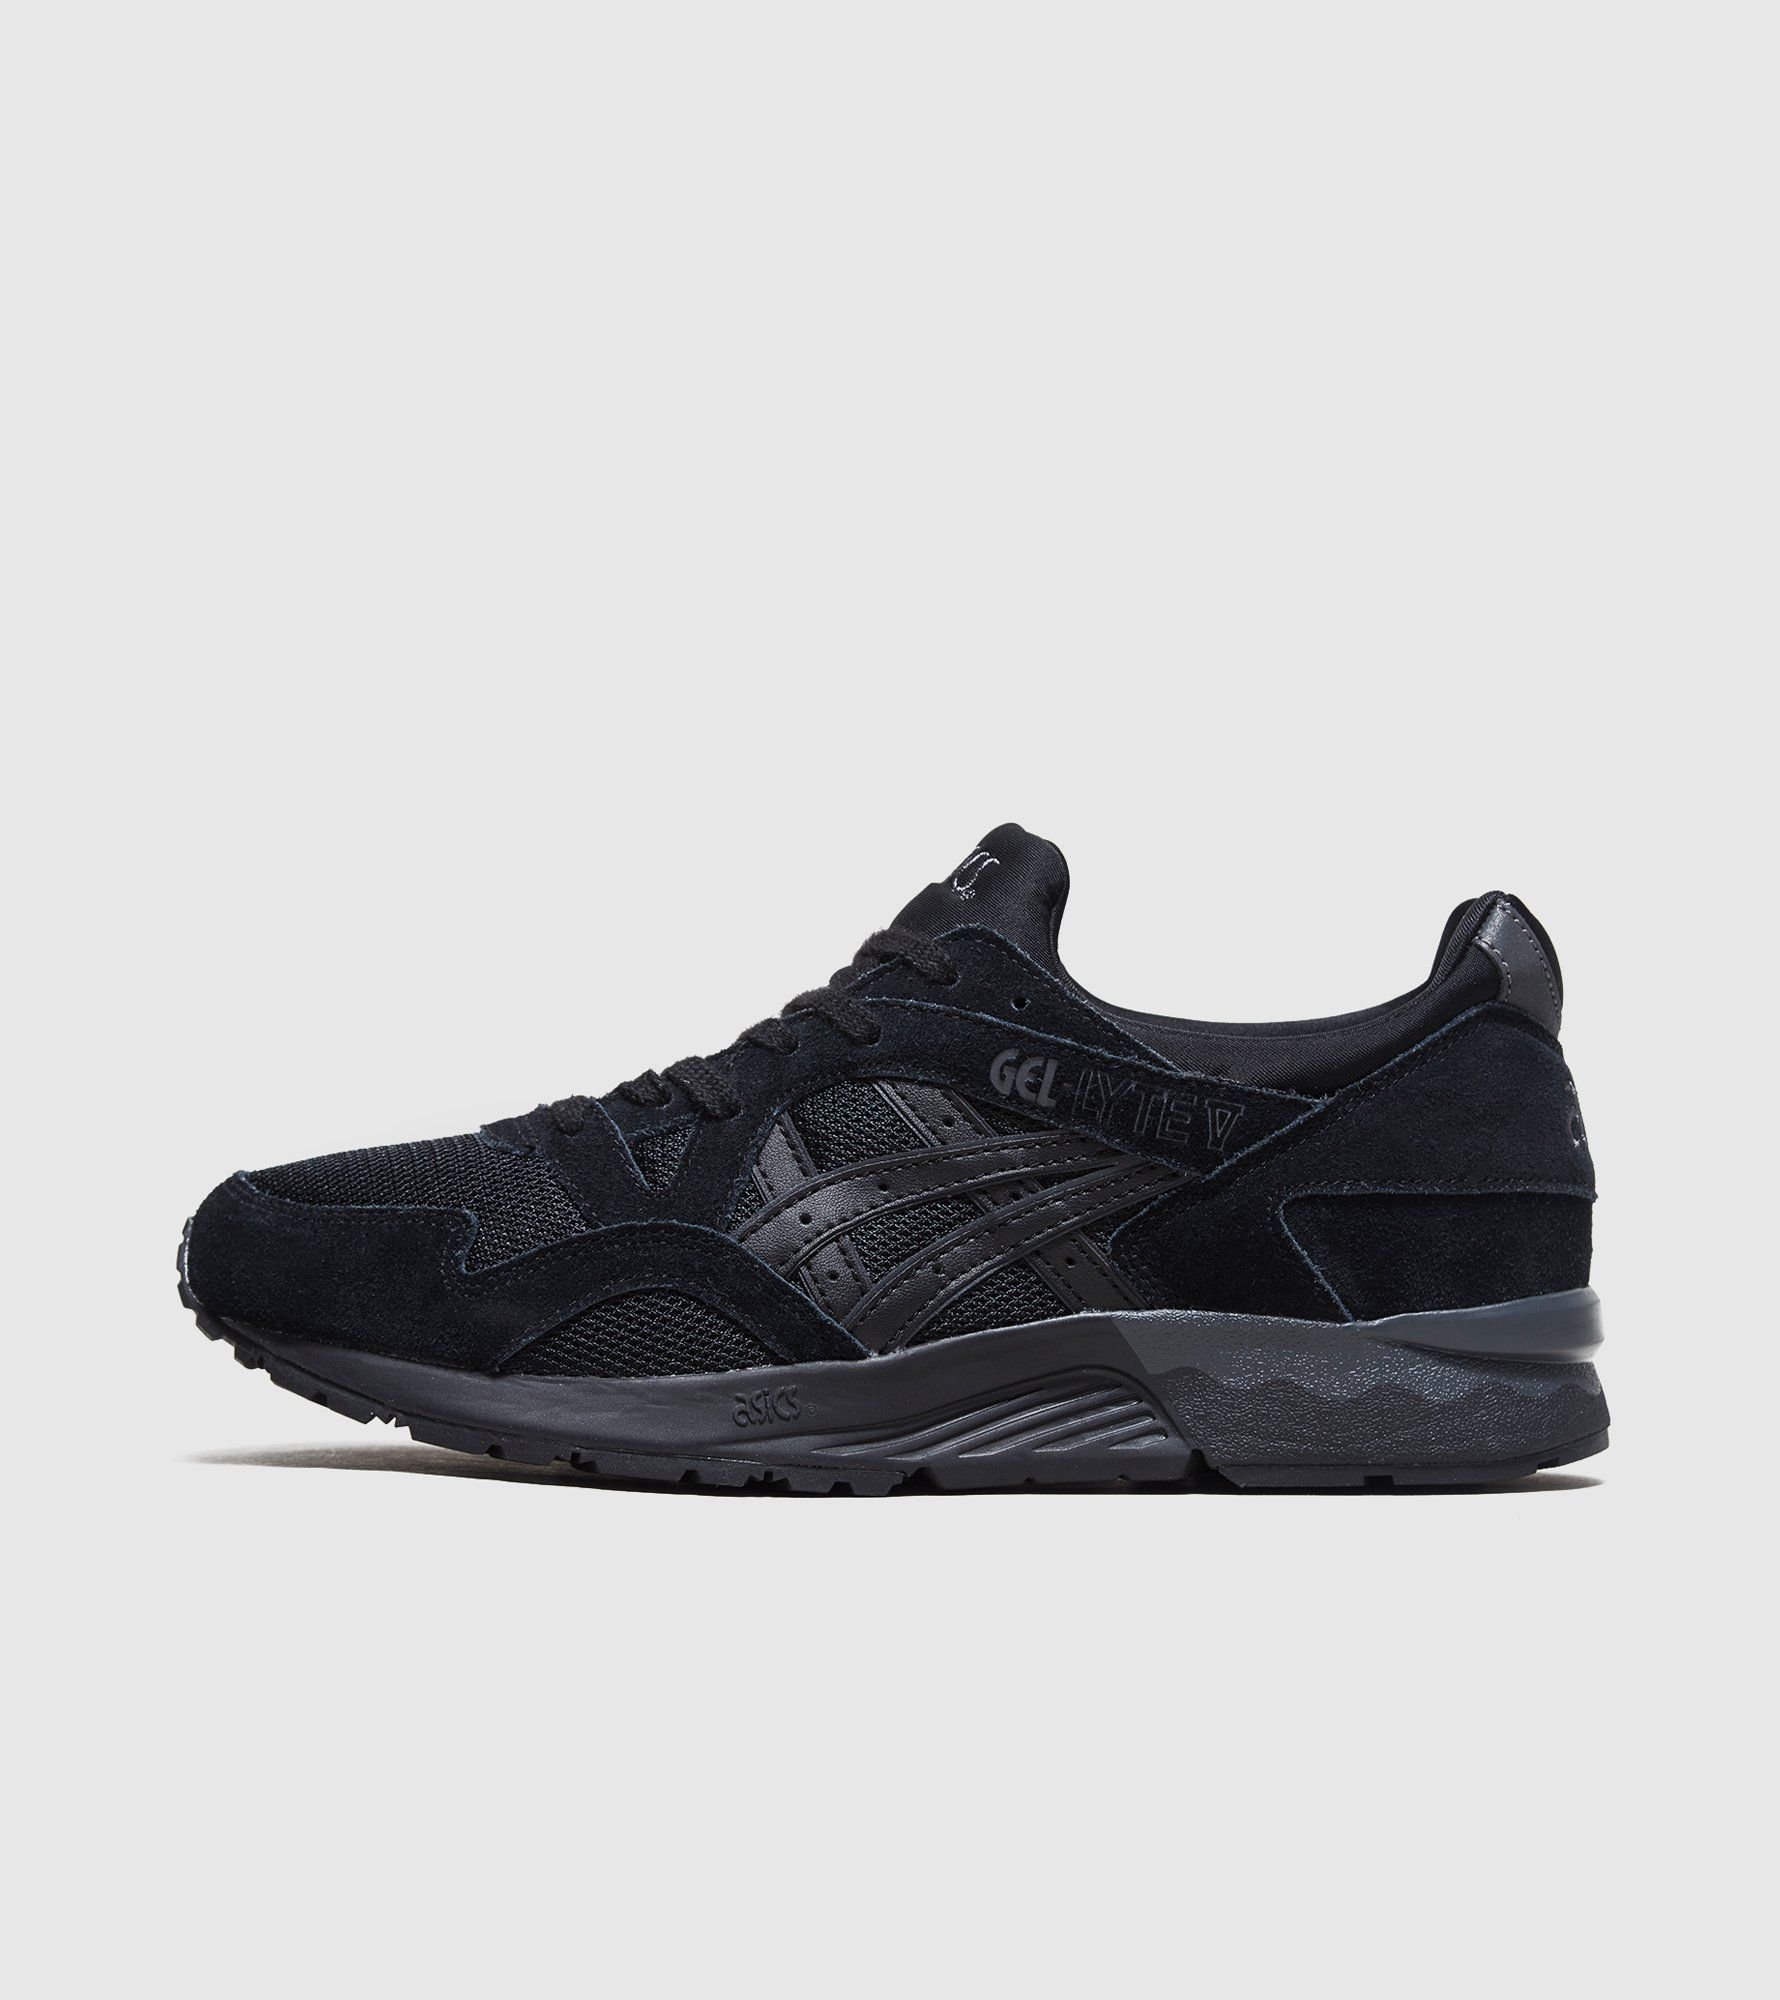 asics laces black